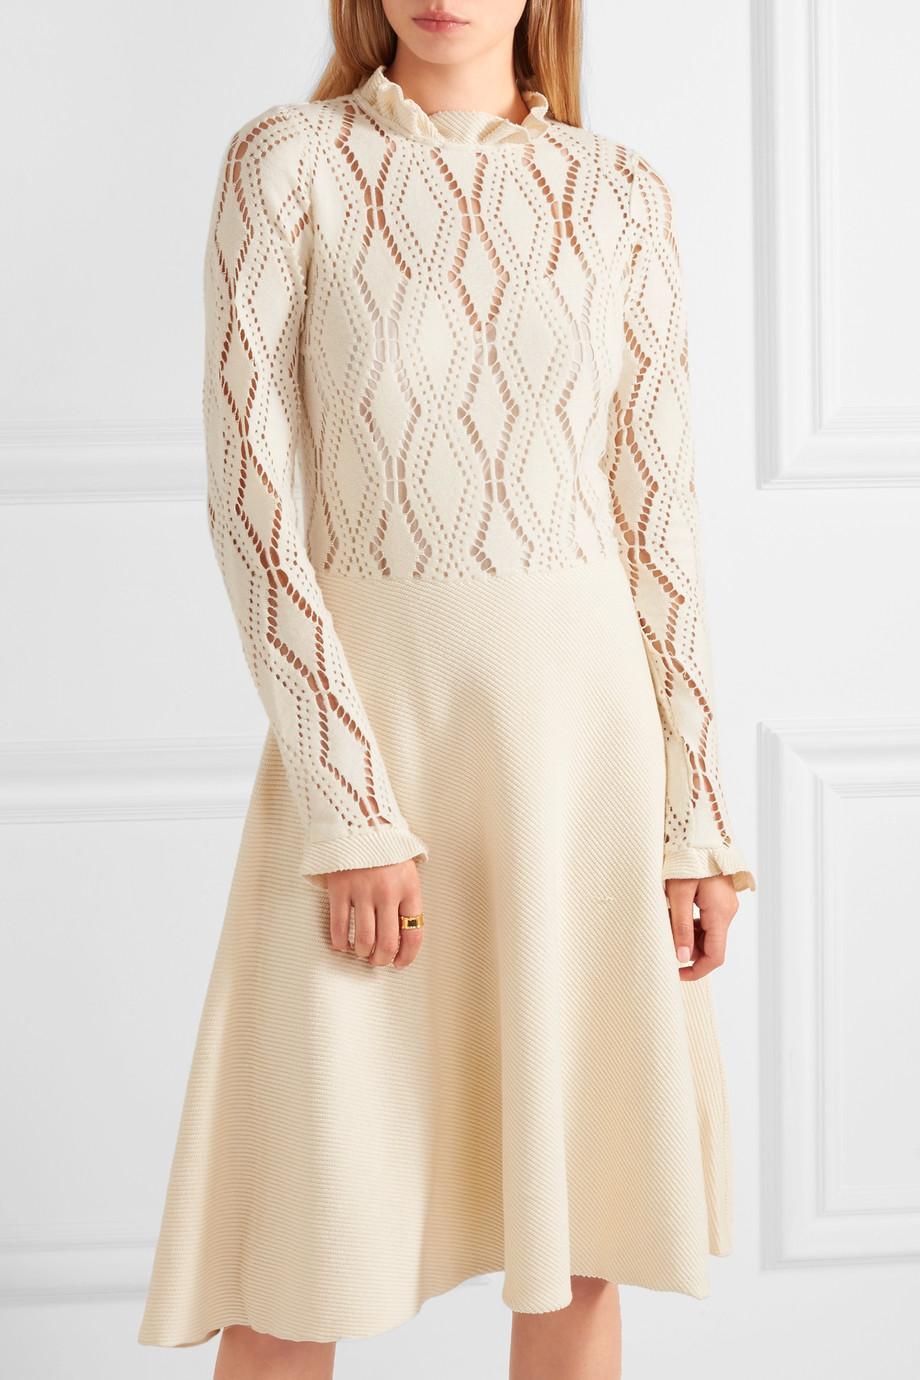 Cream See by Chloé dress